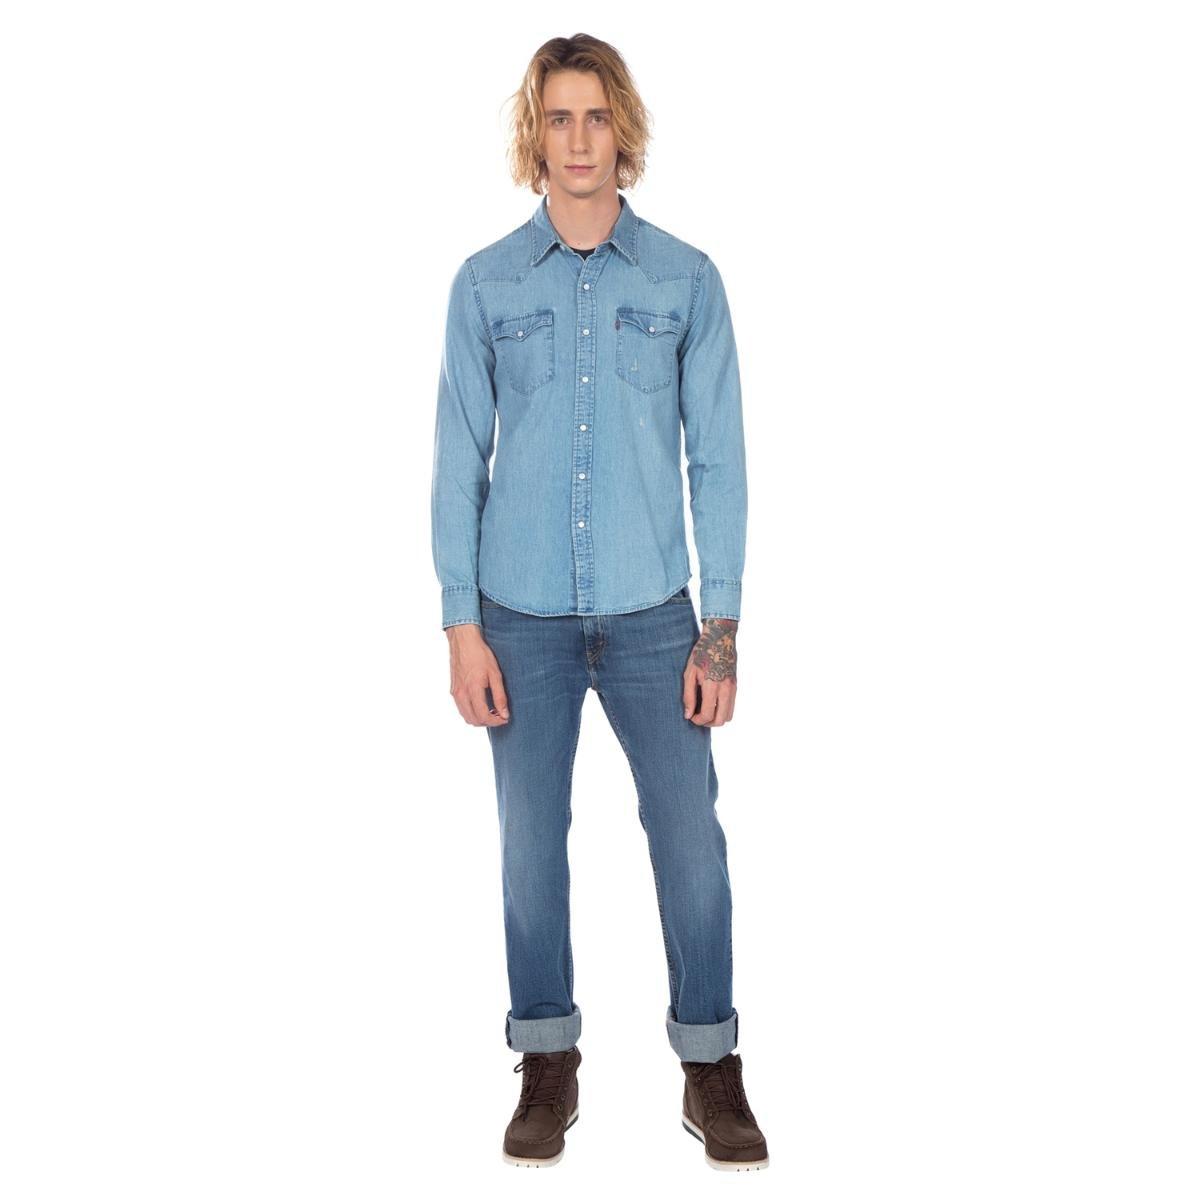 Camisa Levis Jeans Masculino Classic Western - Compre Agora  03caa6f20a9